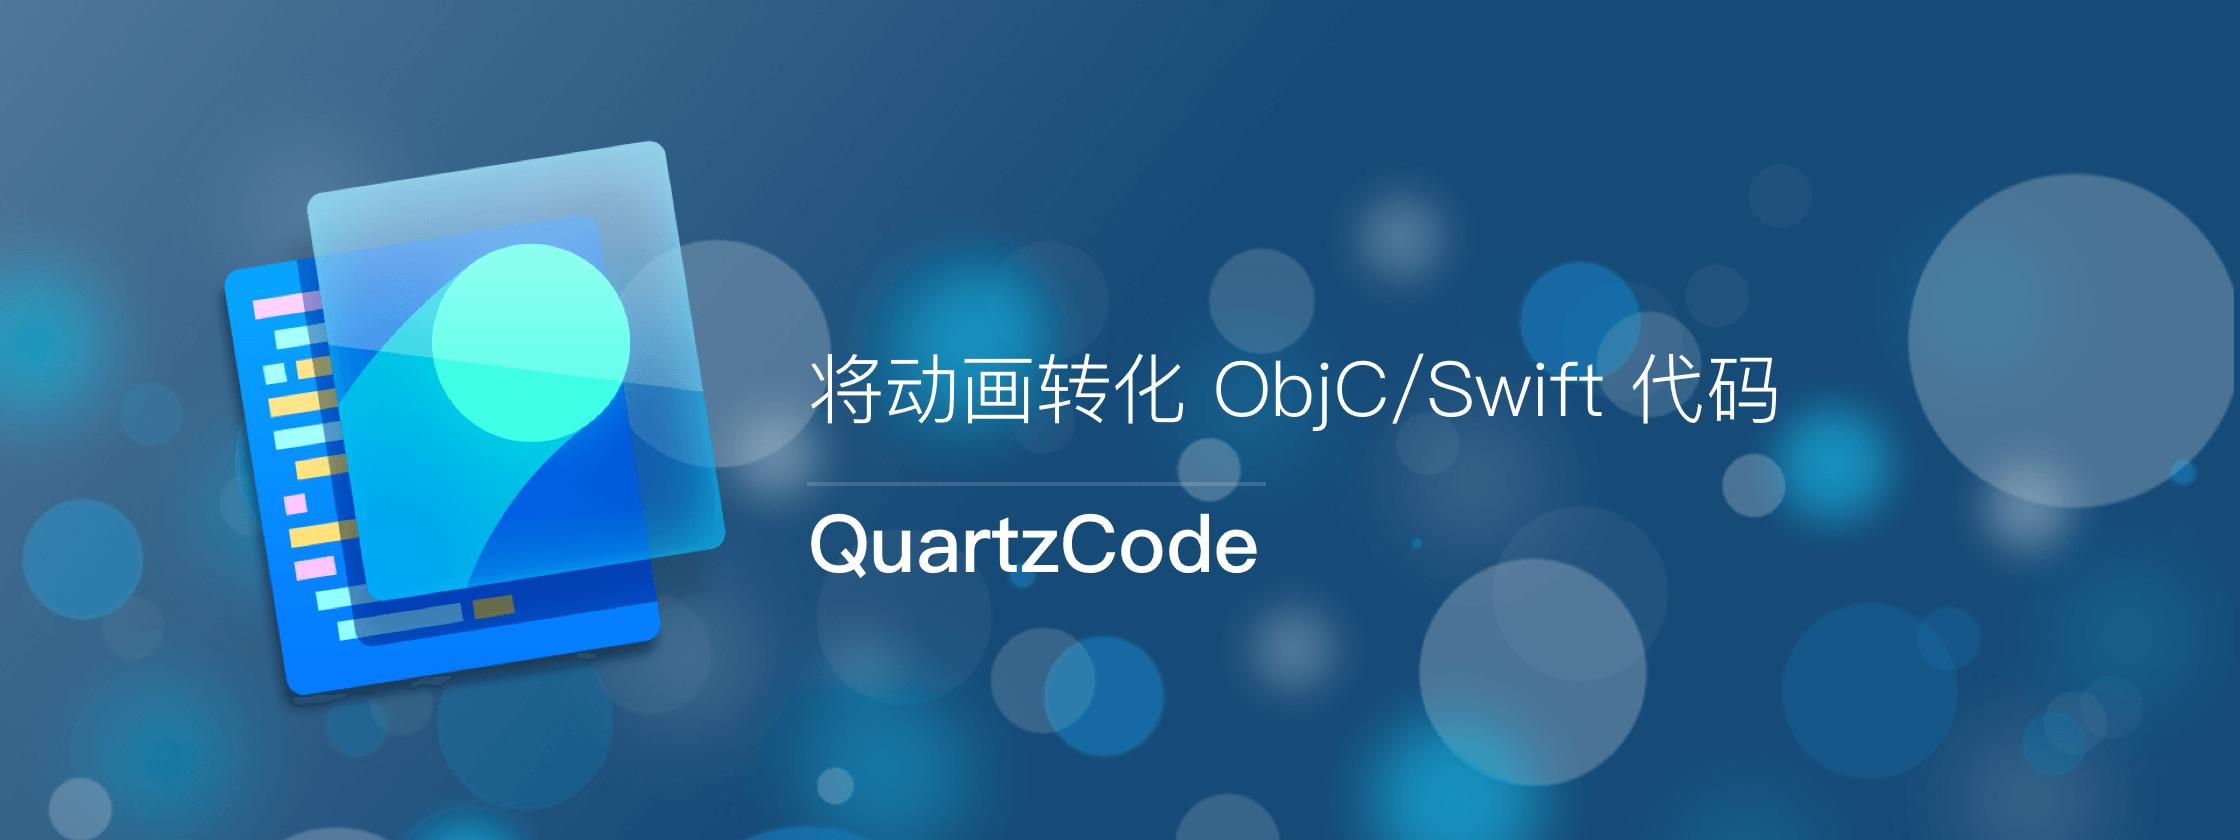 QuartzCode for Mac 将动画转化 ObjC/Swift 代码